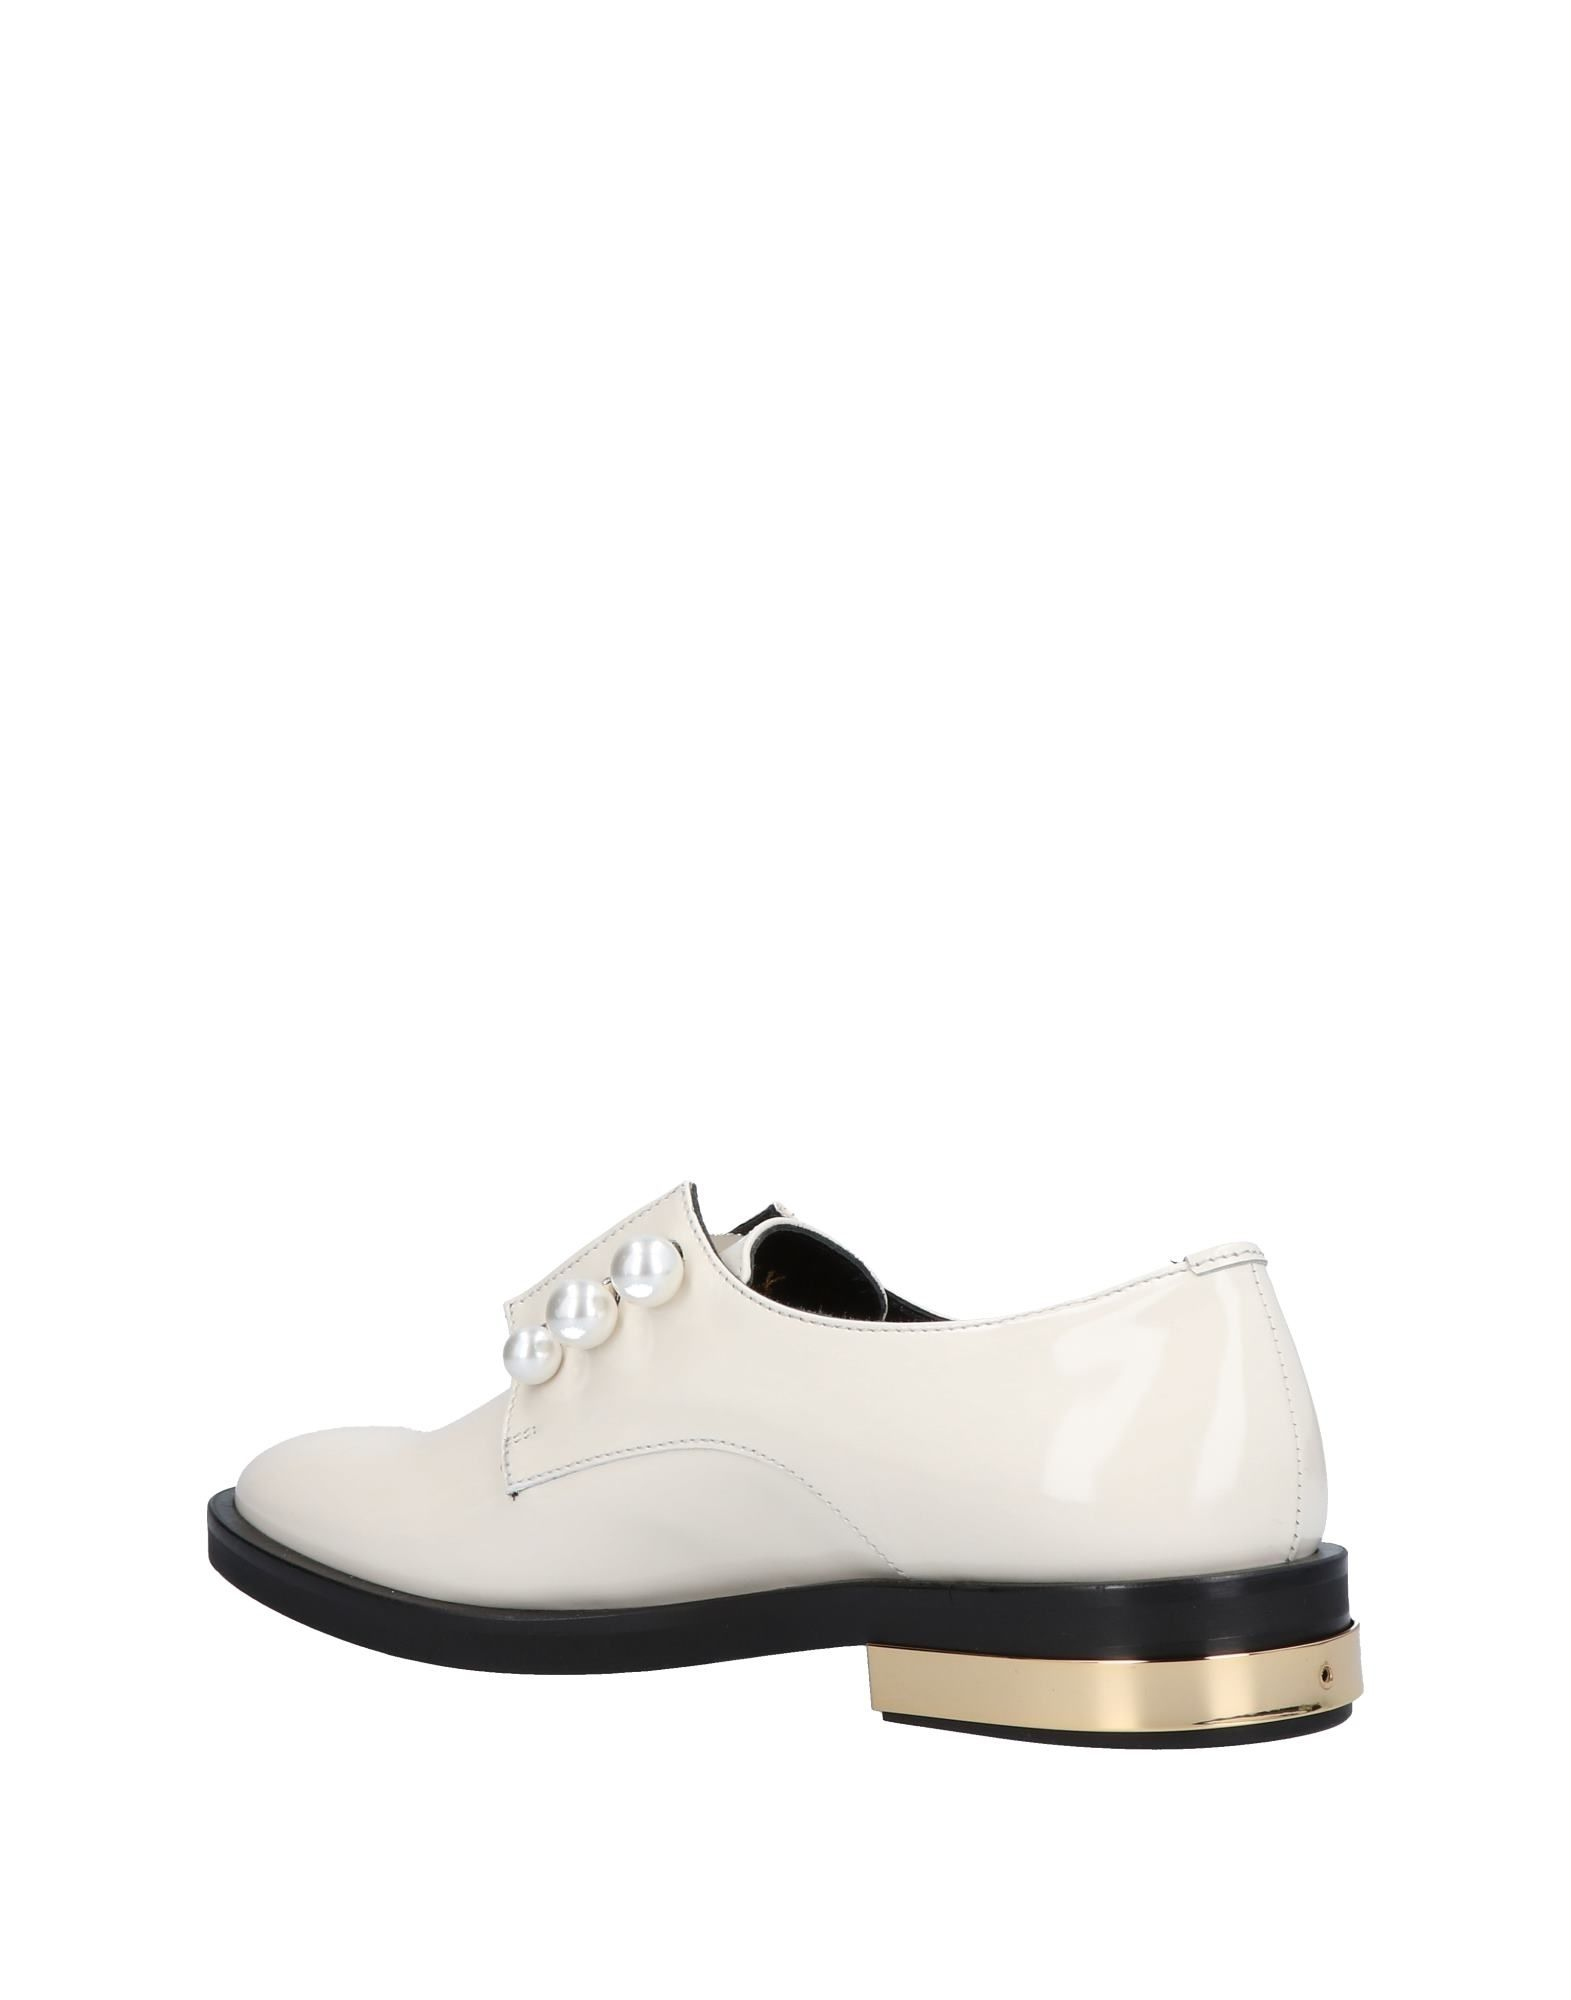 Coliac Martina Grasselli gut Mokassins Damen  11459340FOGünstige gut Grasselli aussehende Schuhe f3e5f1